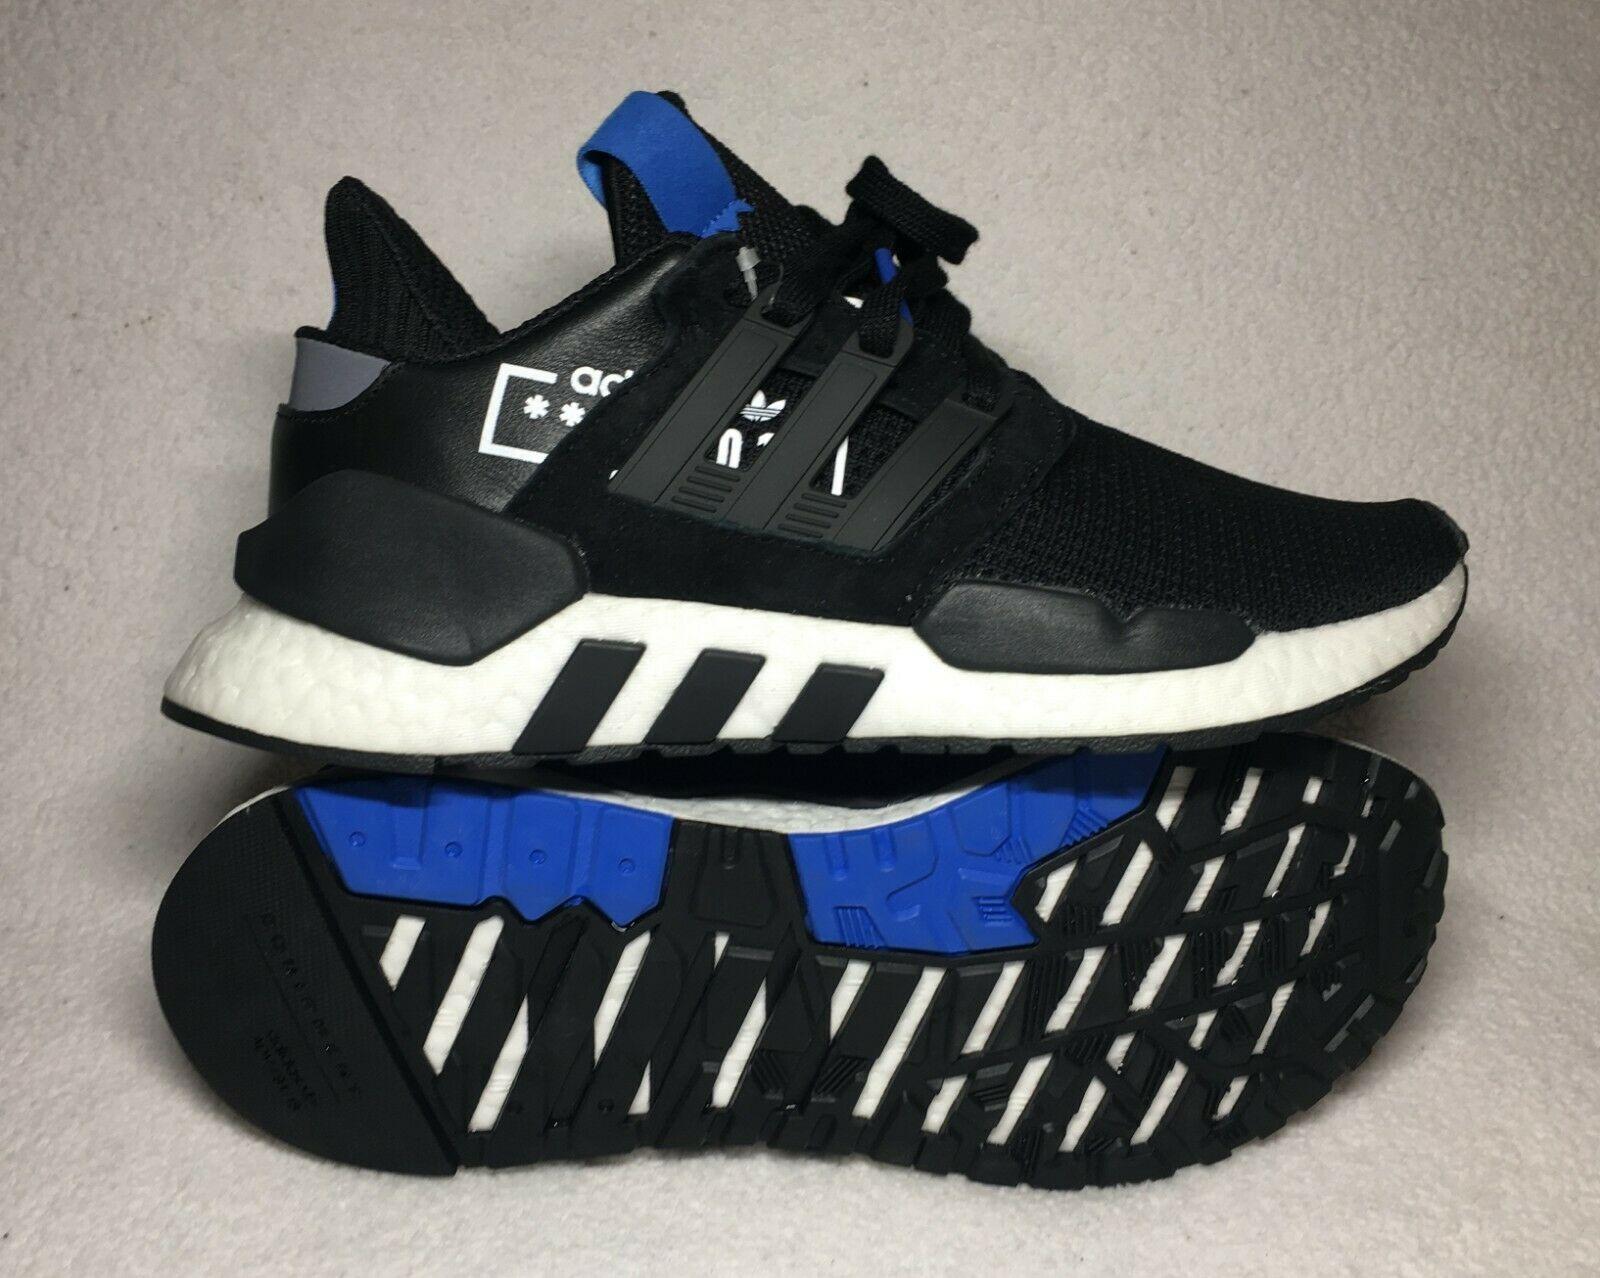 Adidas Eqt Support 91 18 Alphatype